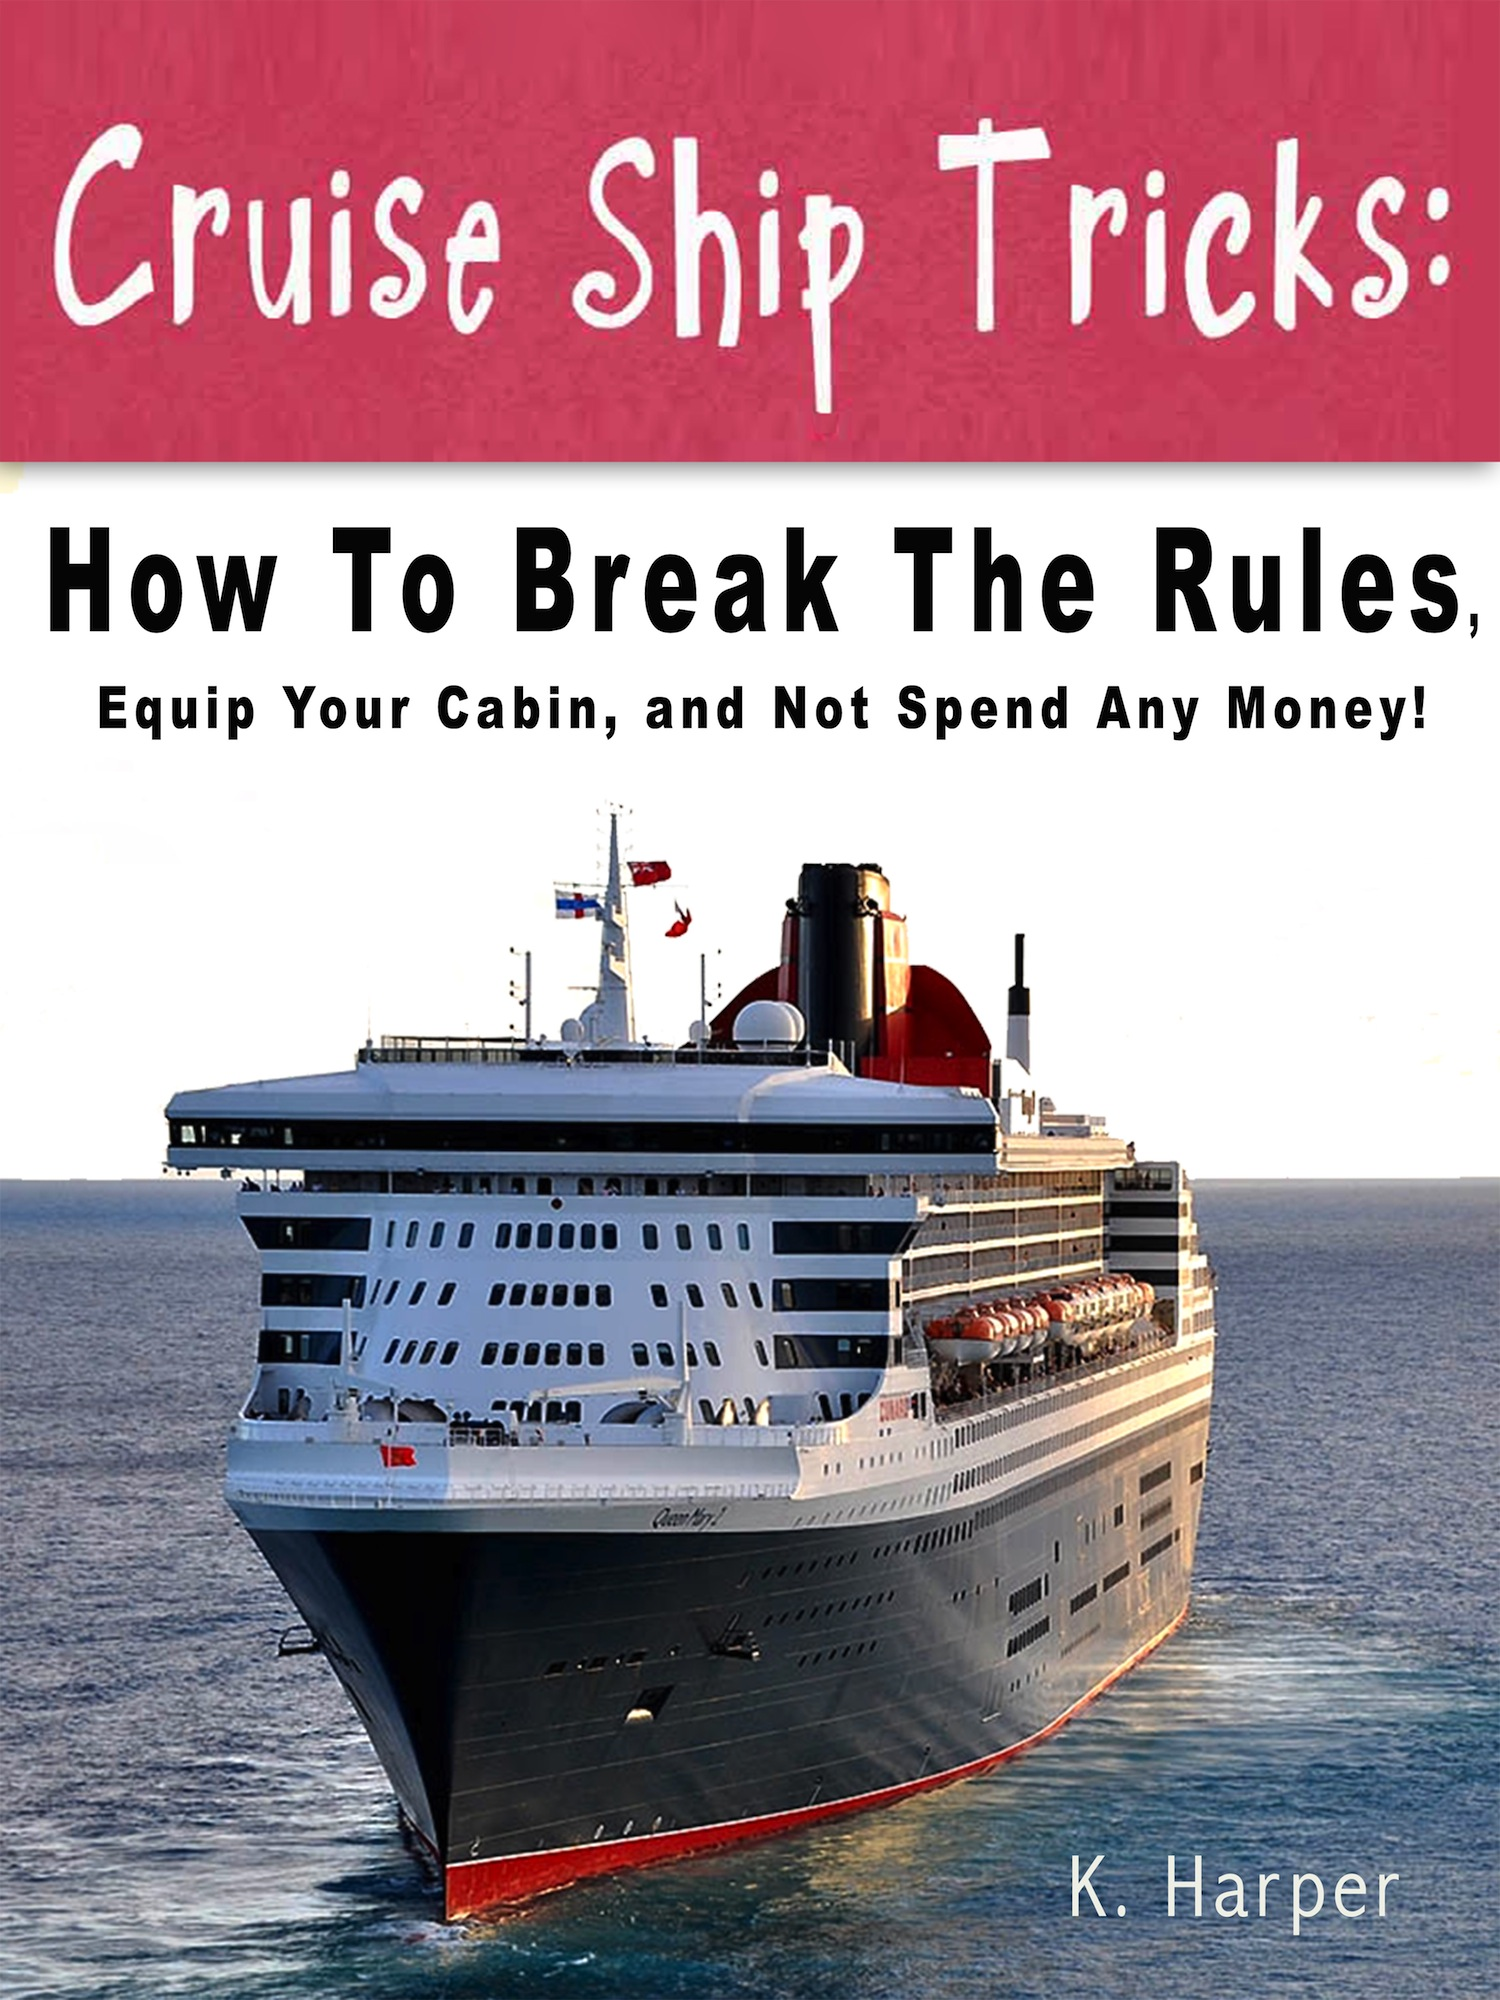 Smashwords Cruise Ship Tricks Booklet A Book By Kate Harper - Cruise ship tricks